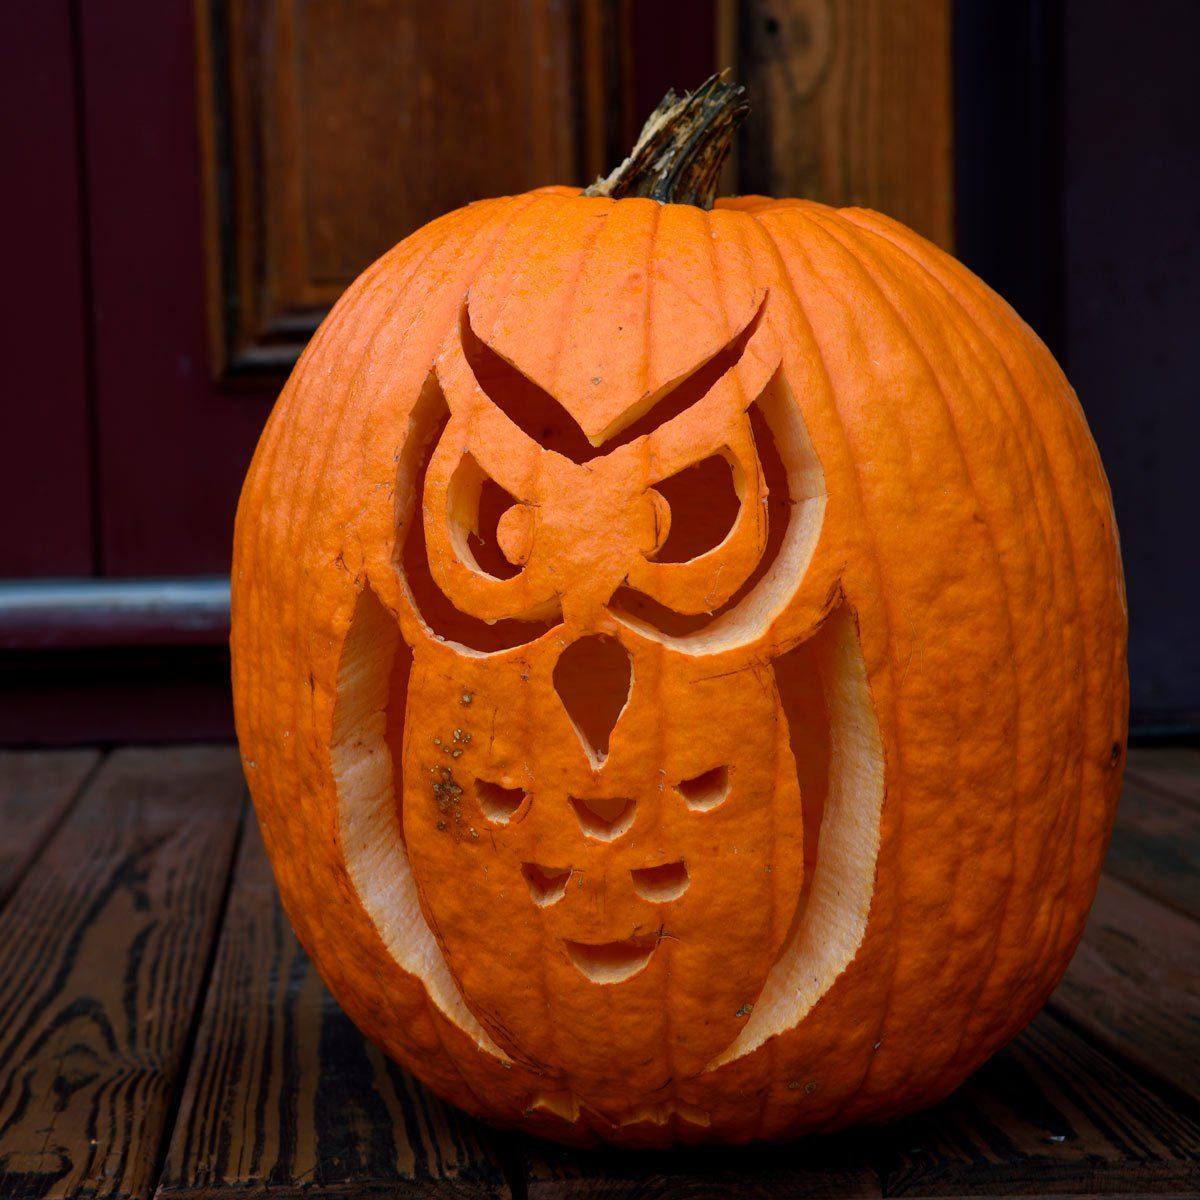 Owl pumpking carving